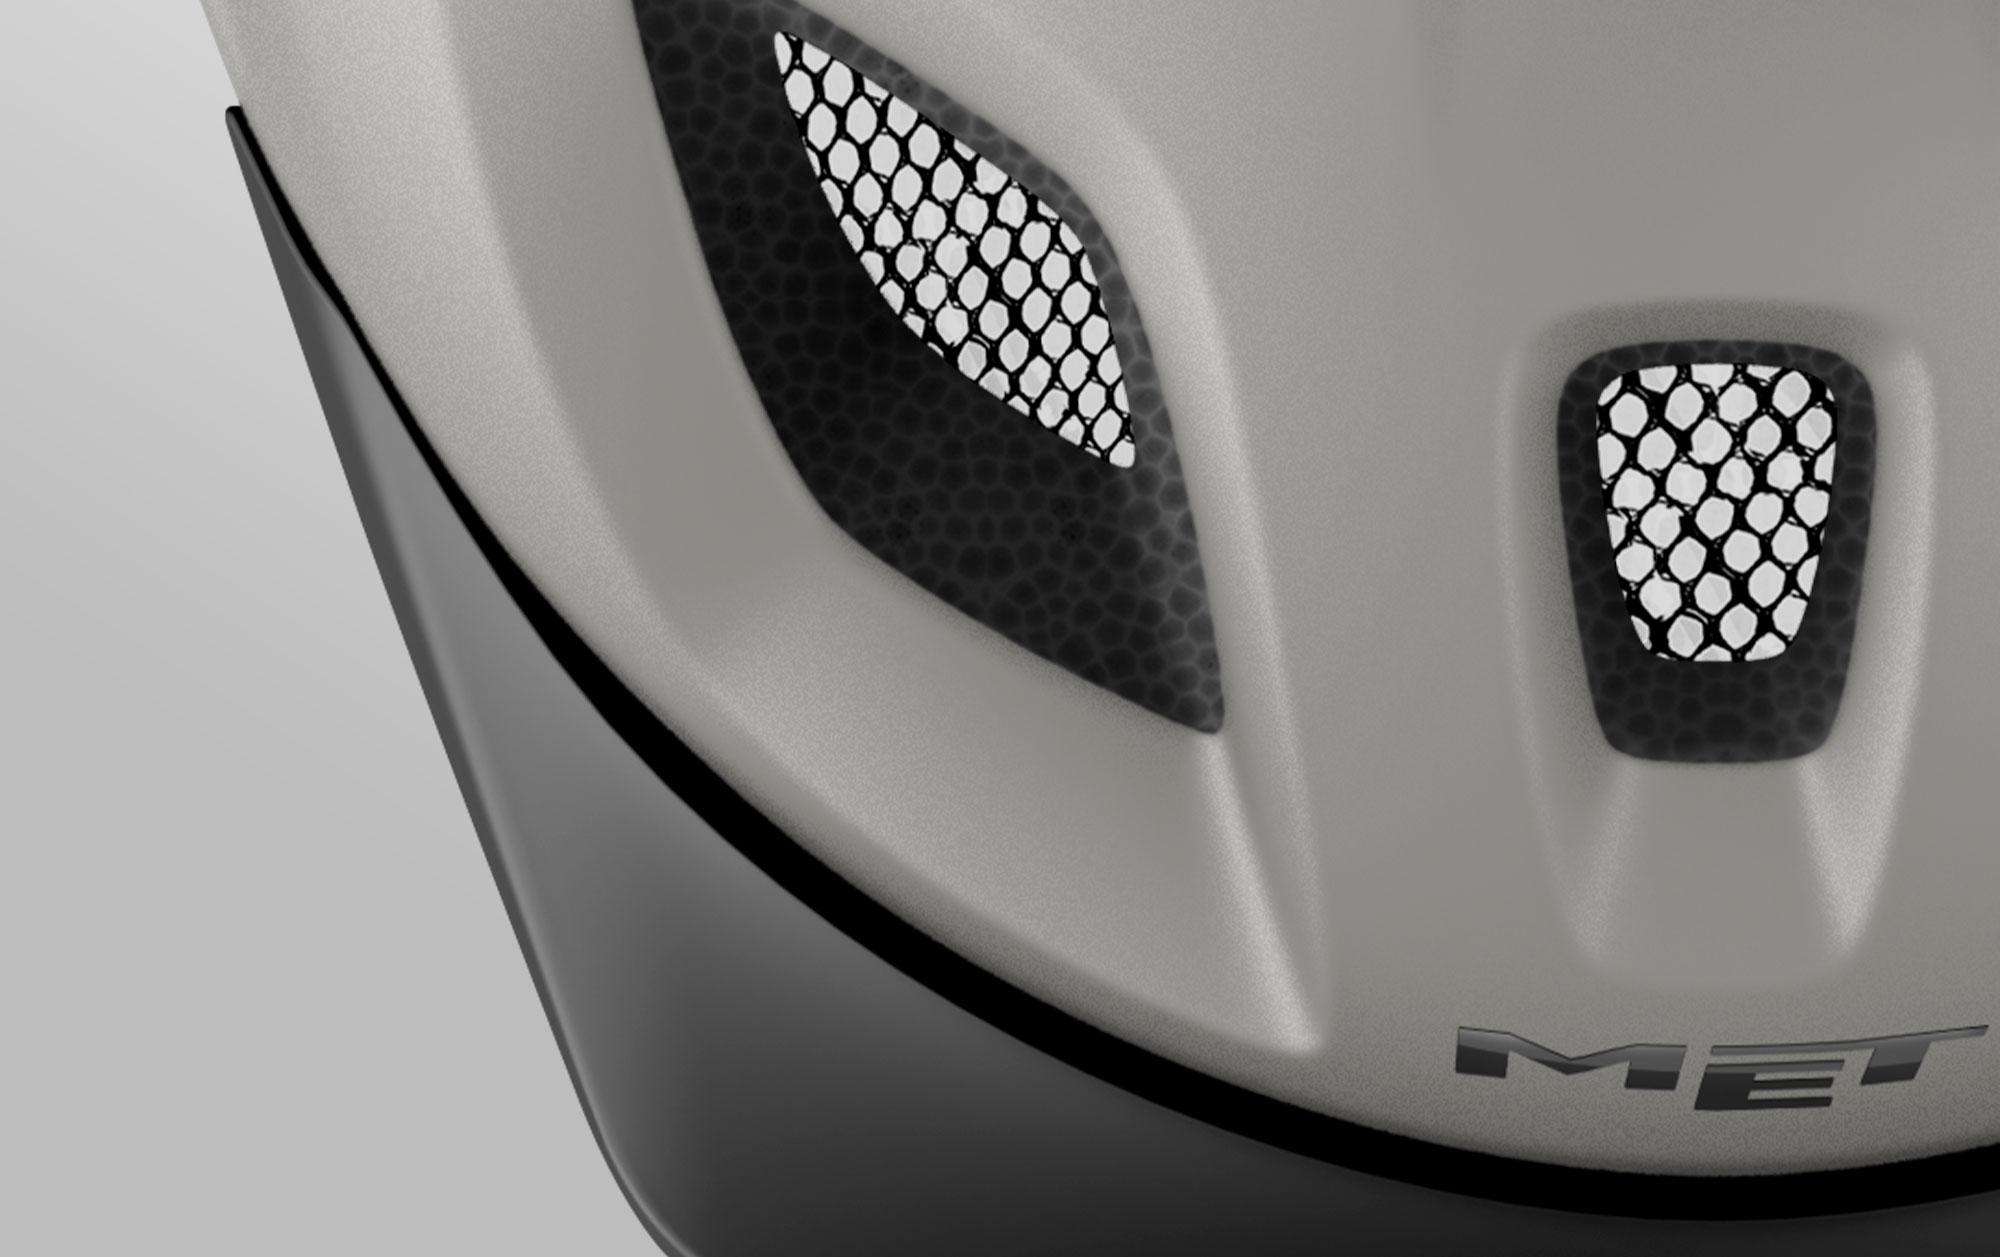 MET Mobilite Mips Urban, E-Bike and Commuting Helmet Anti-insect Net